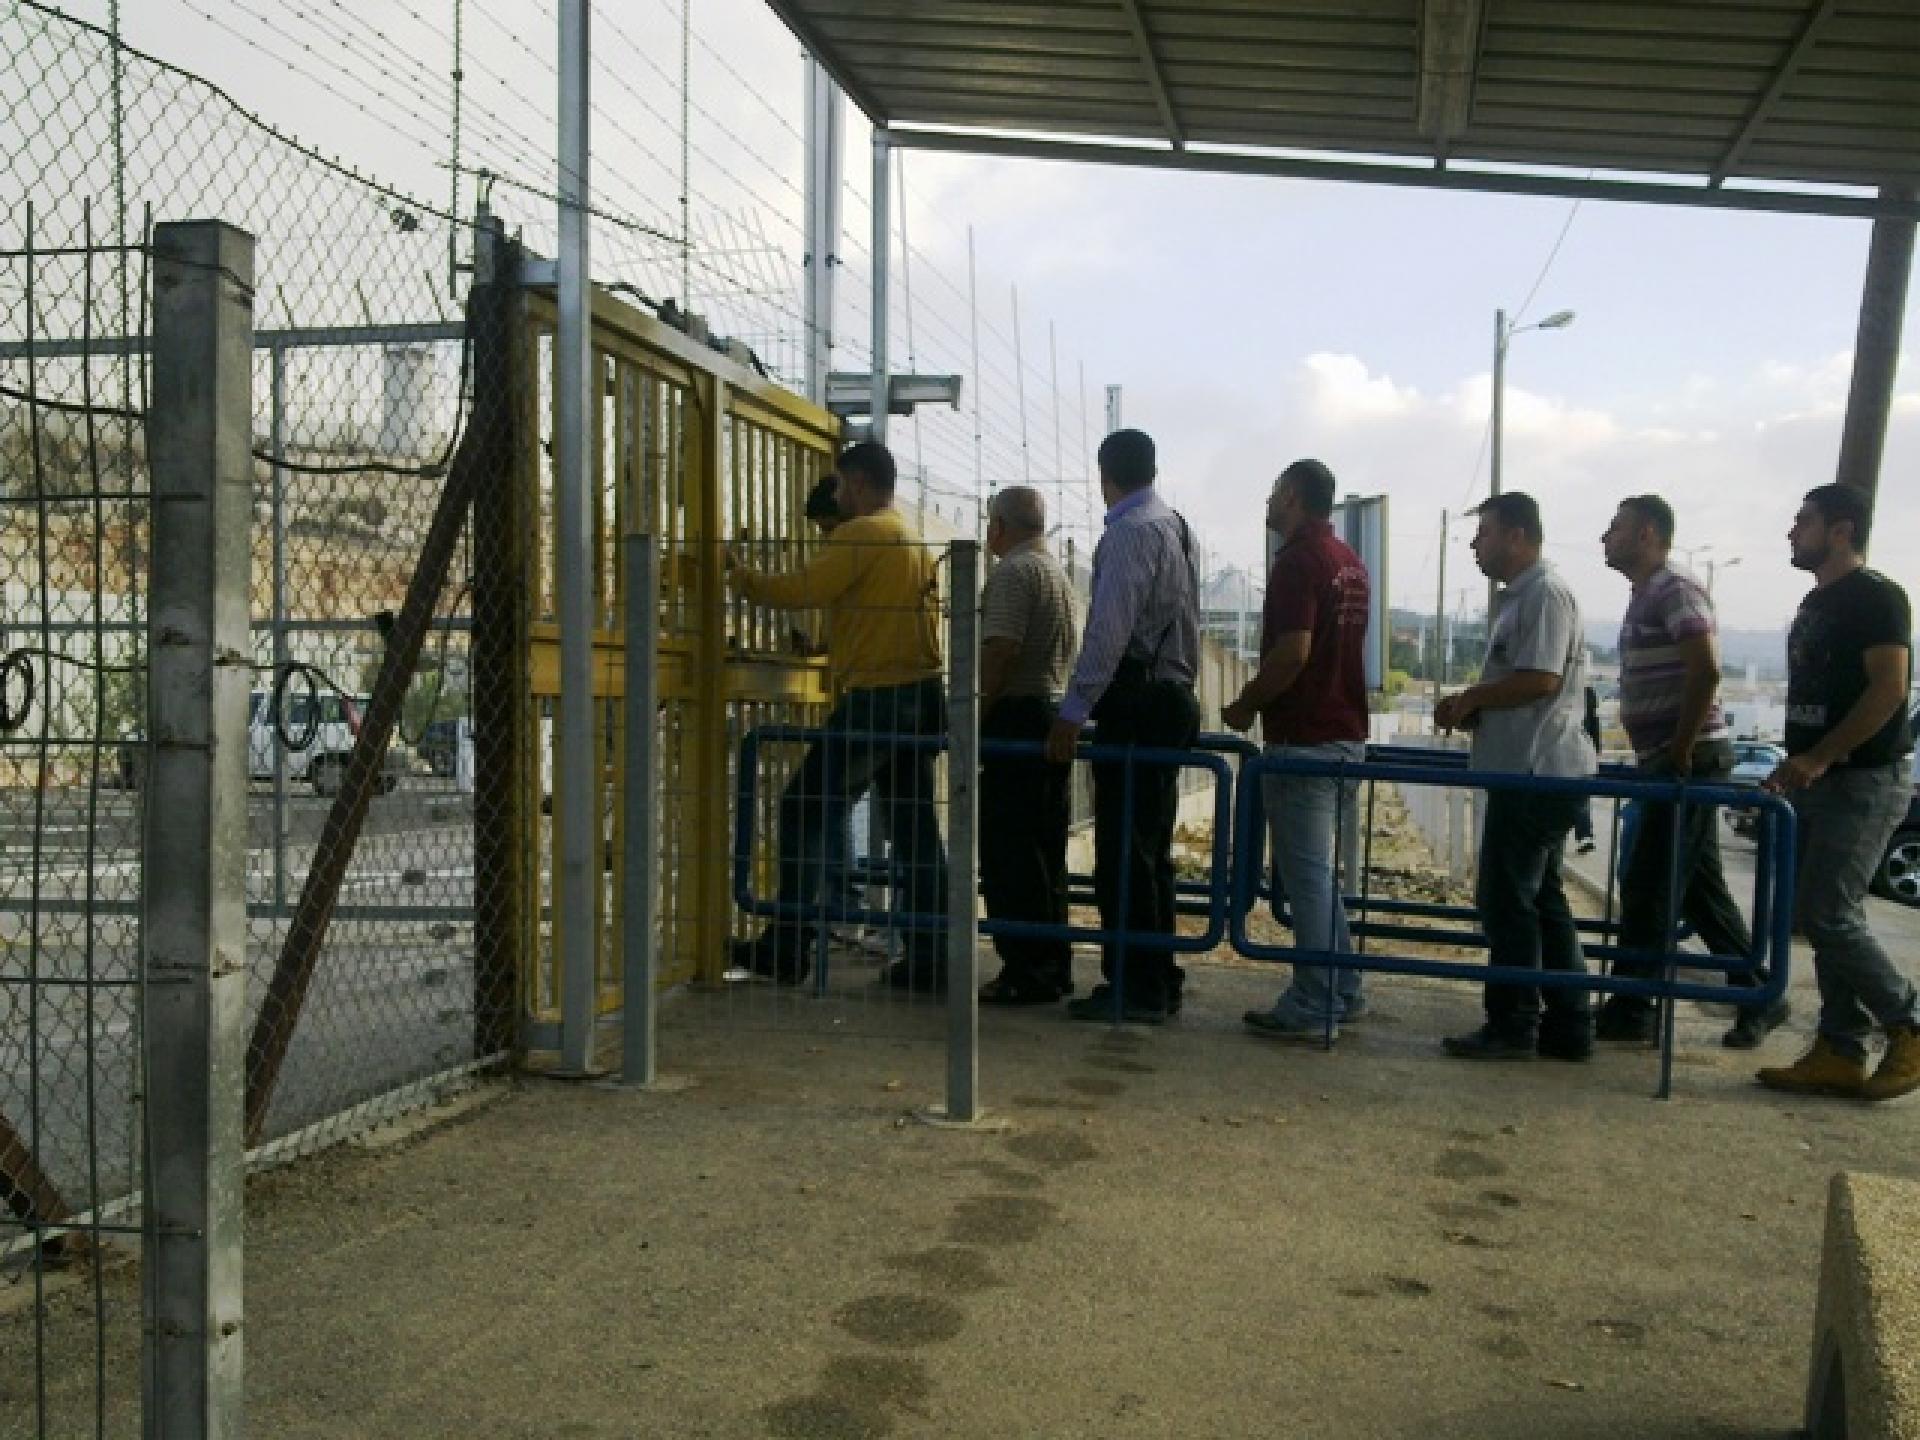 Barta'a/Reikhan checkpoint 08.11.12